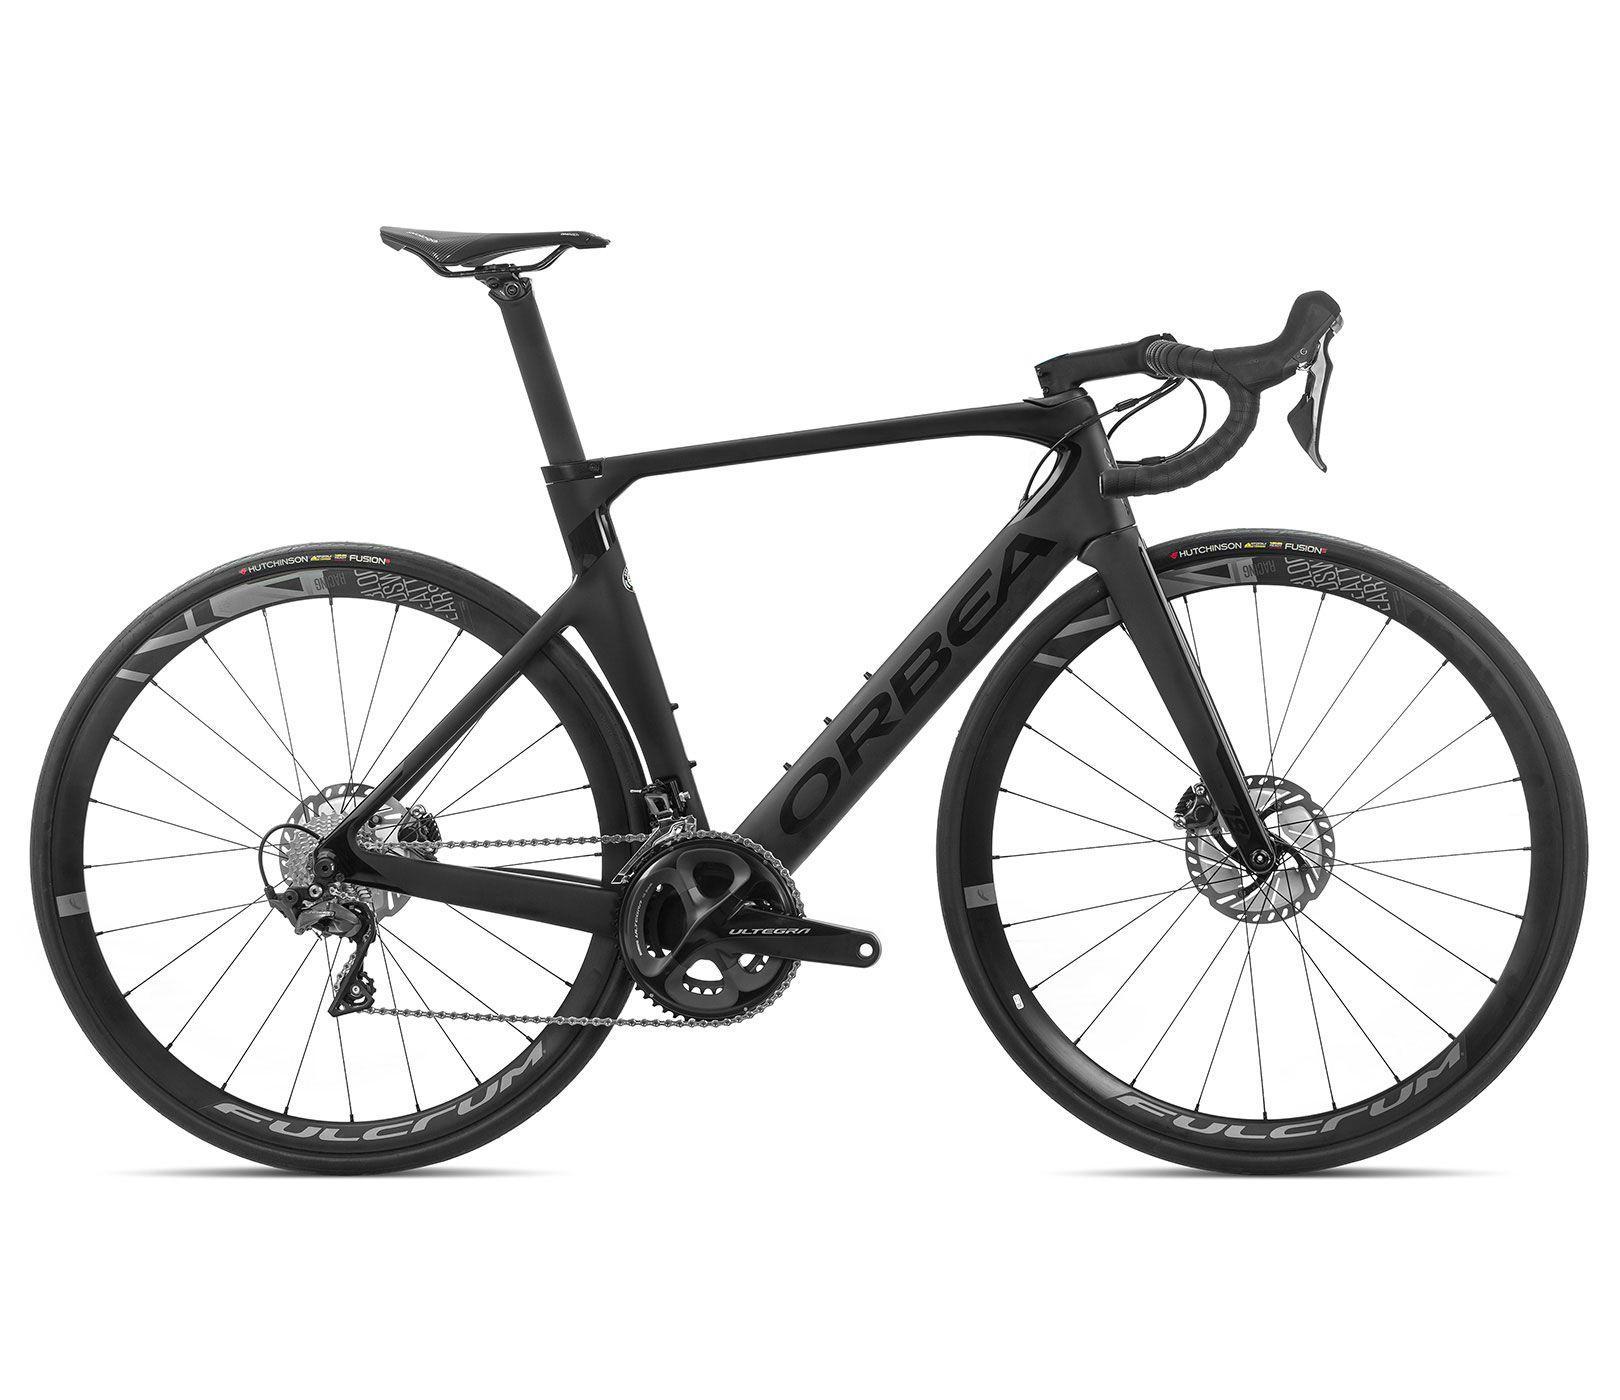 Bicicleta estrada Orbea Orca AERO M20 TEAM-D Tam 55 Preta - 2020